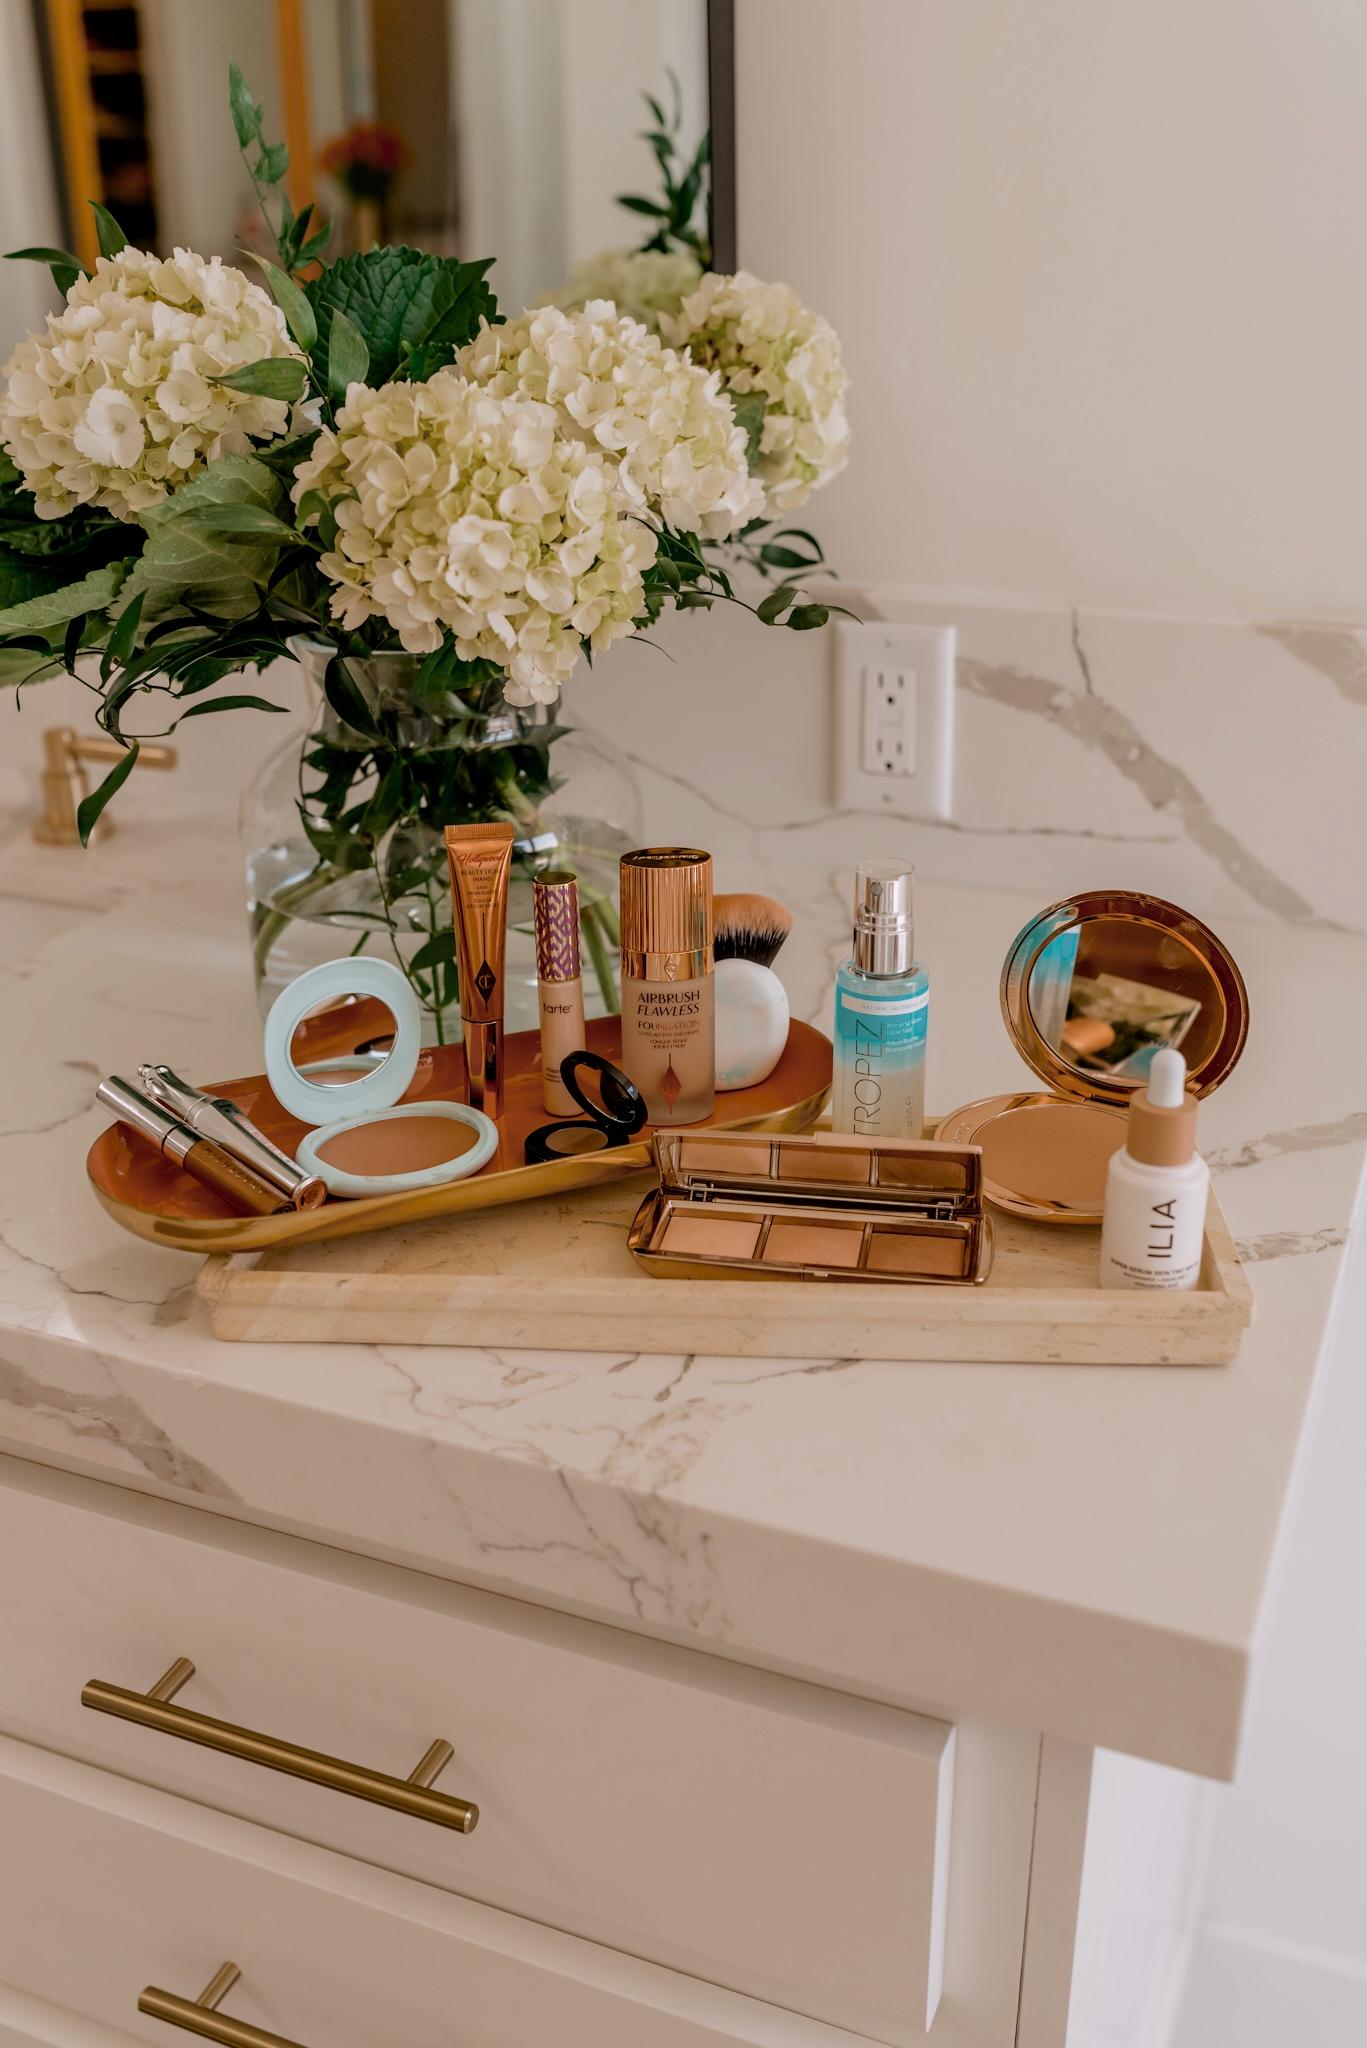 Sephora Beauty Top Picks